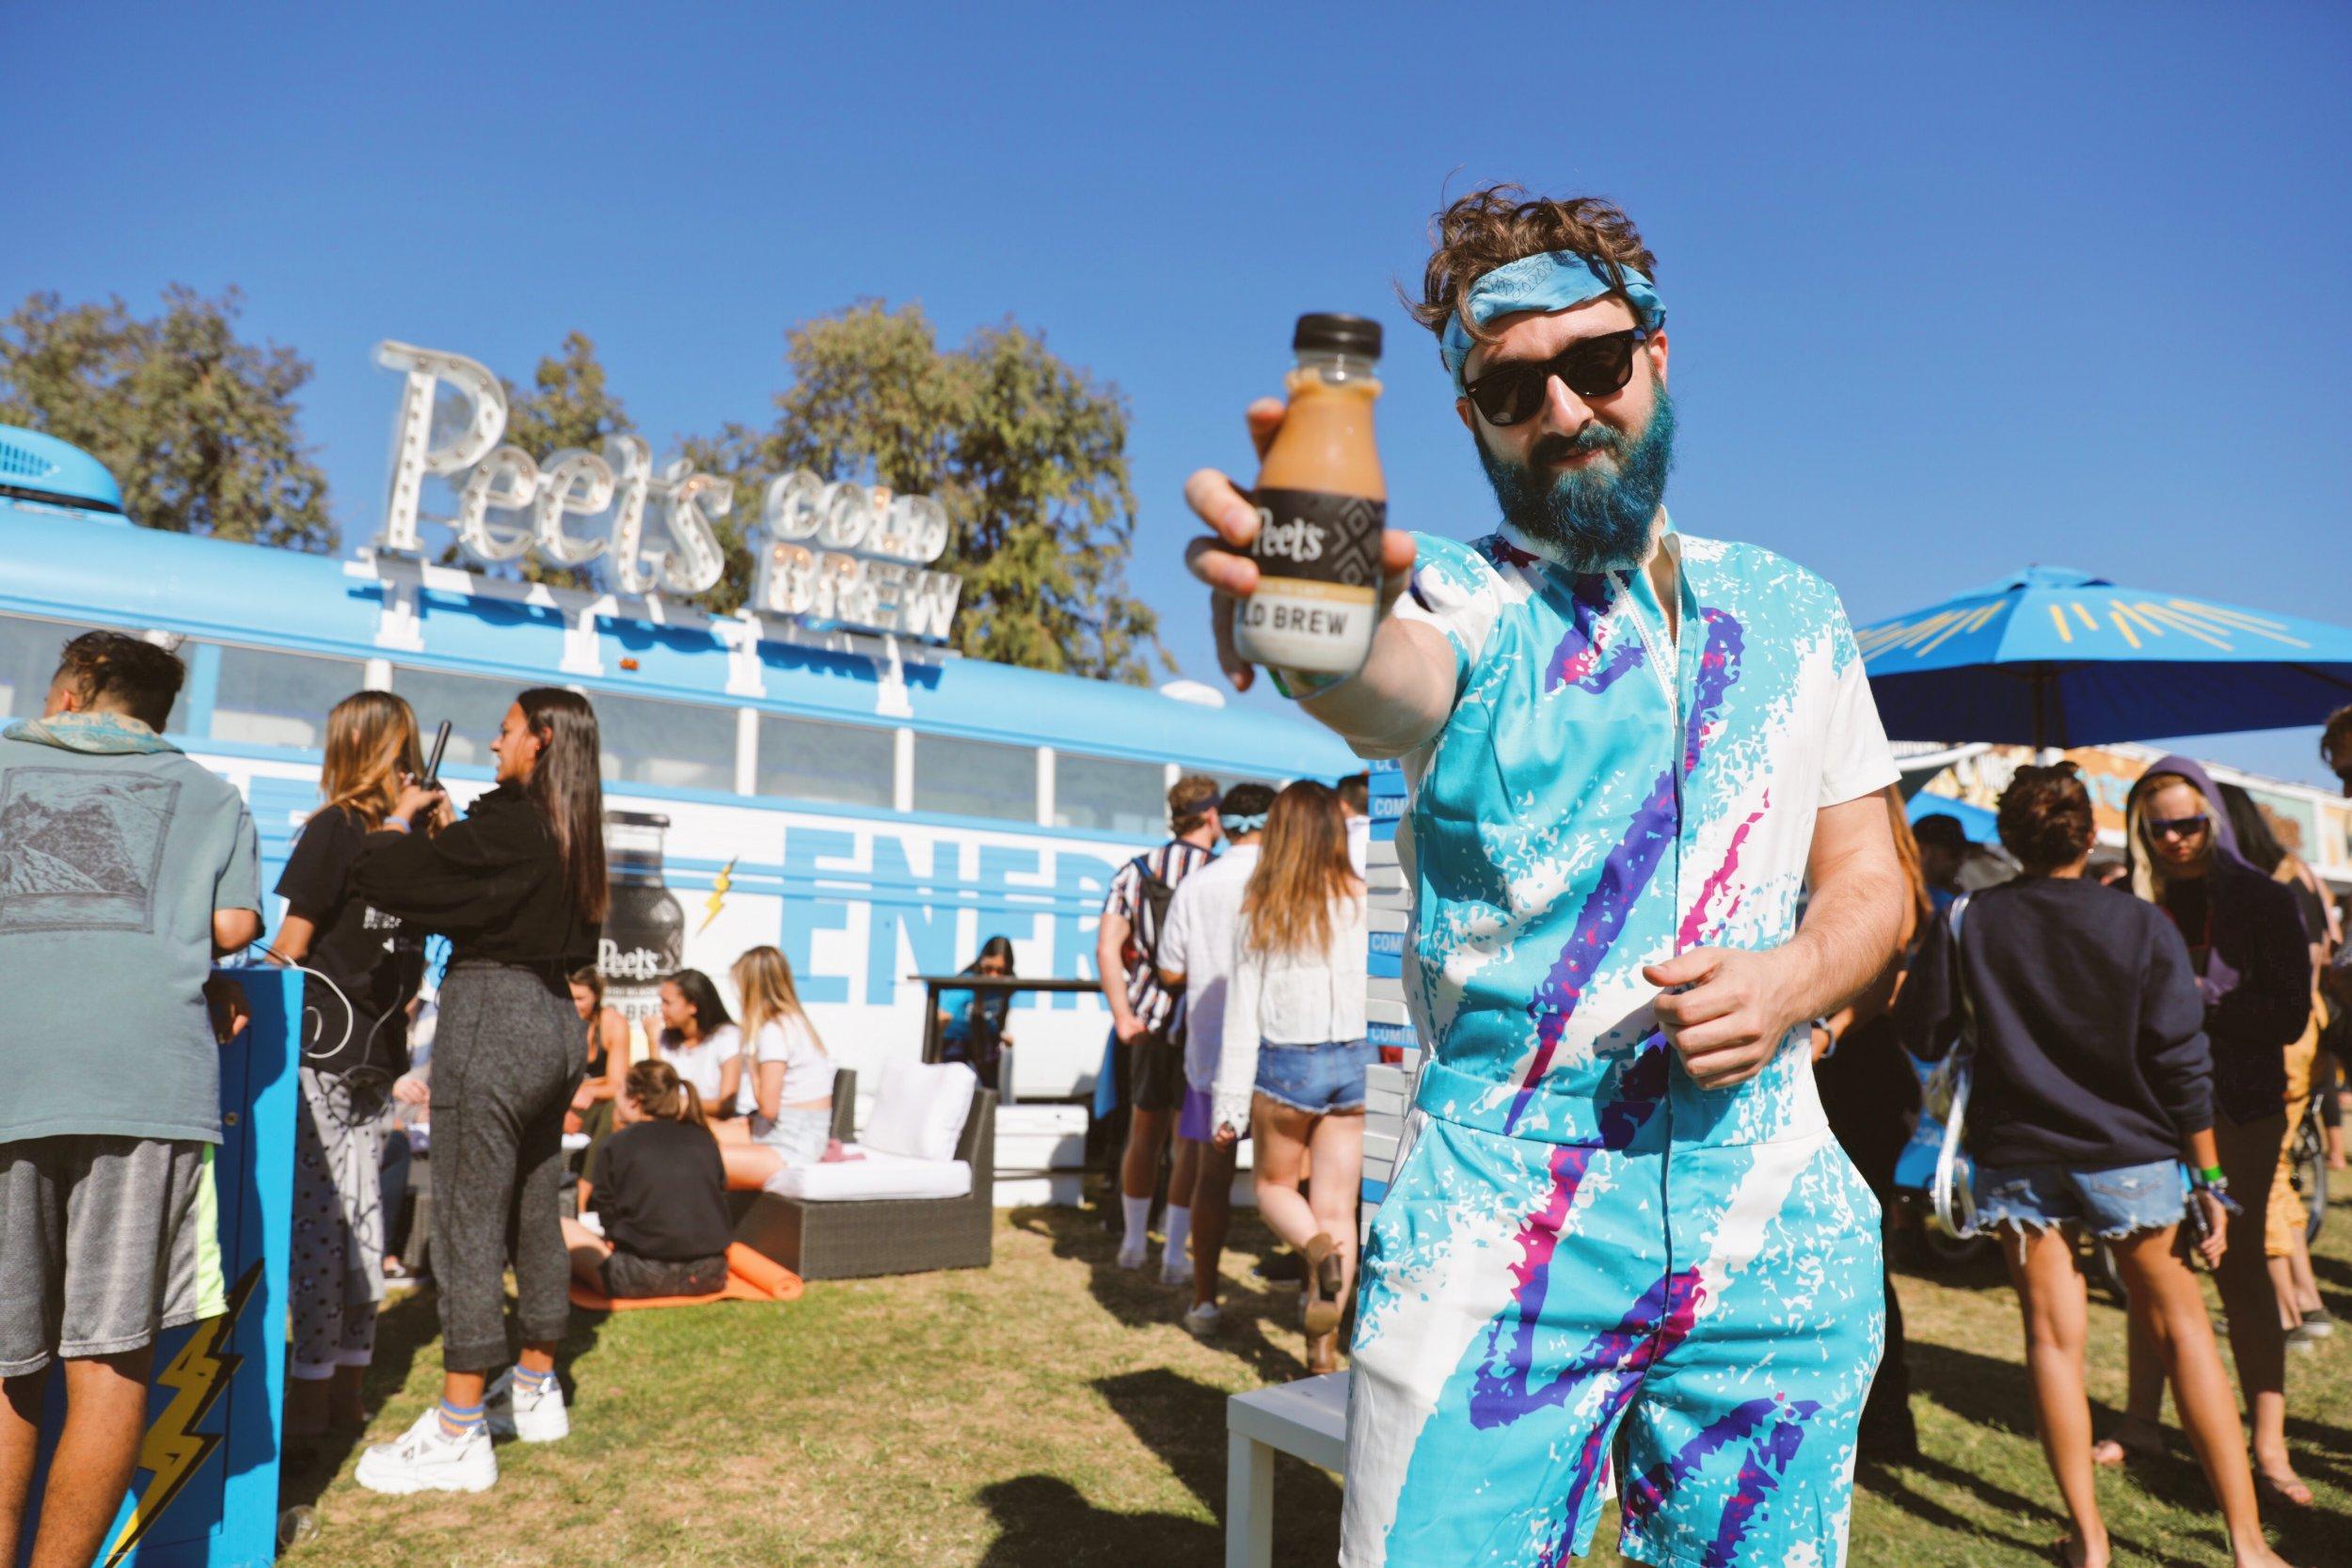 Peet's Cold Brew at Coachella